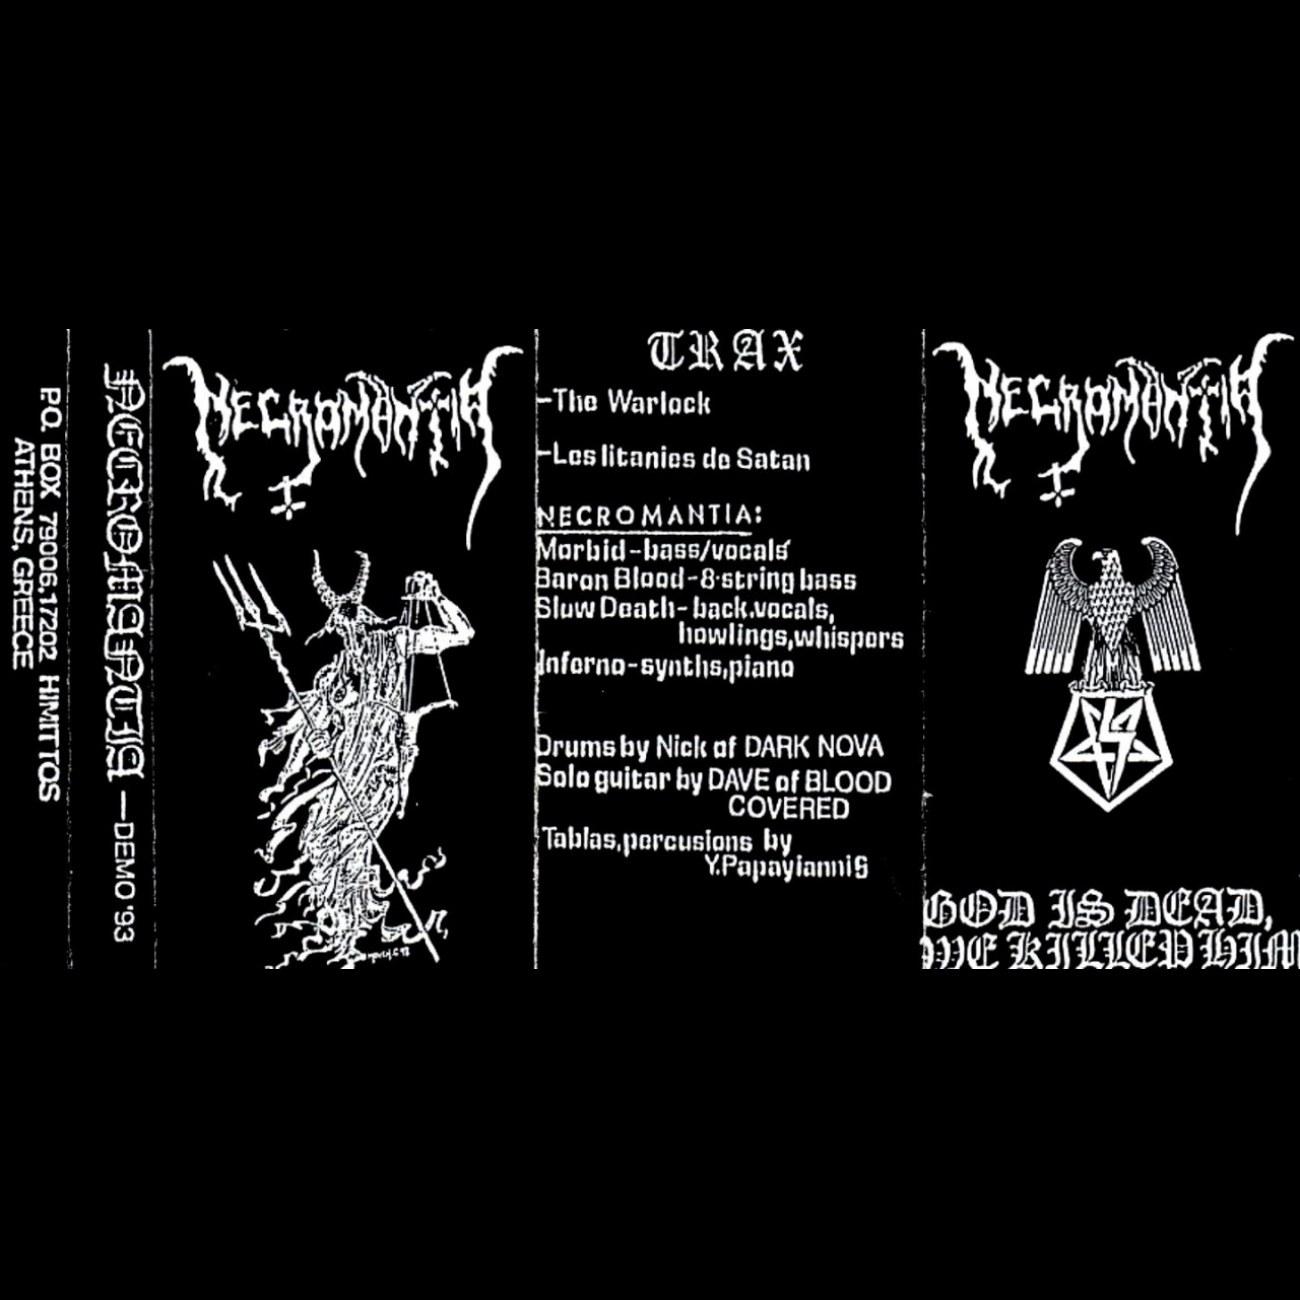 Necromantia - Demo '93